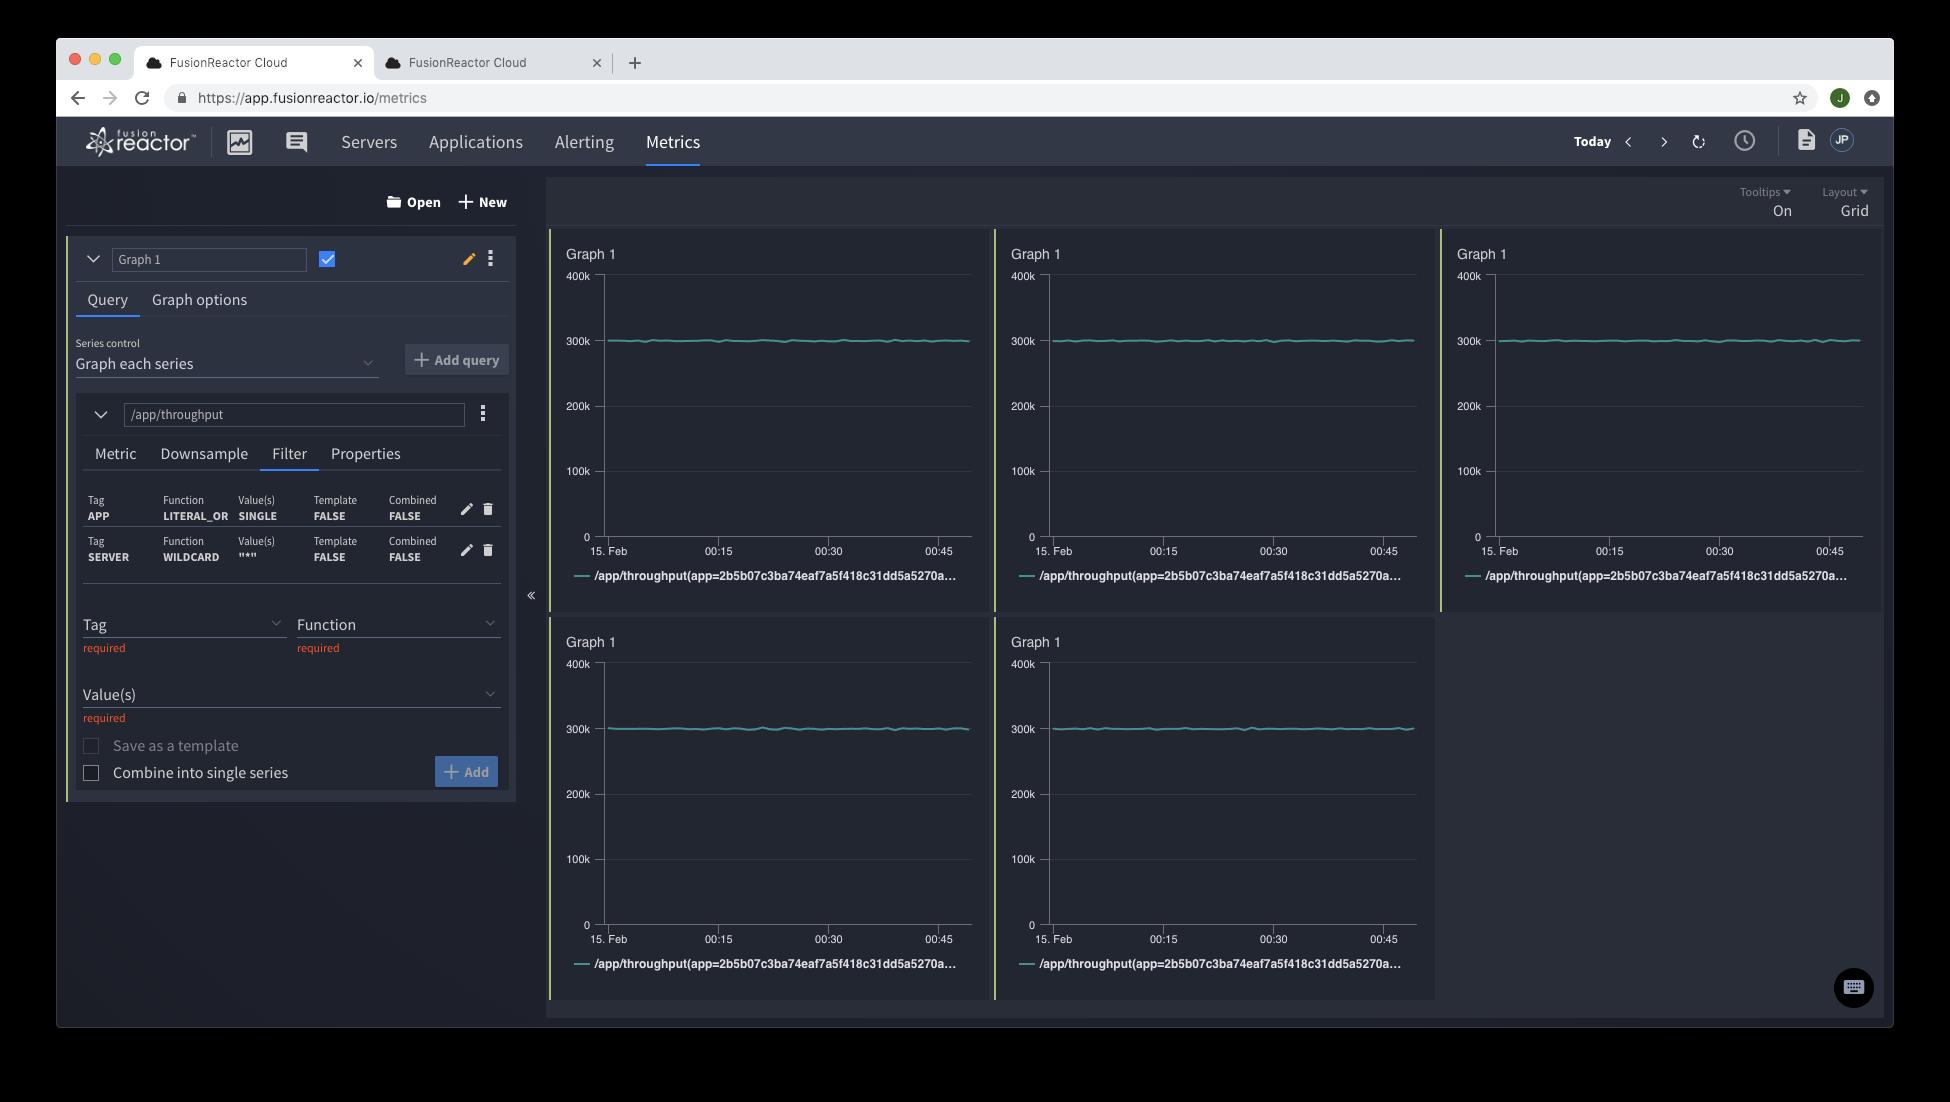 Web metrics explorer - FusionReactor hybrid cloud